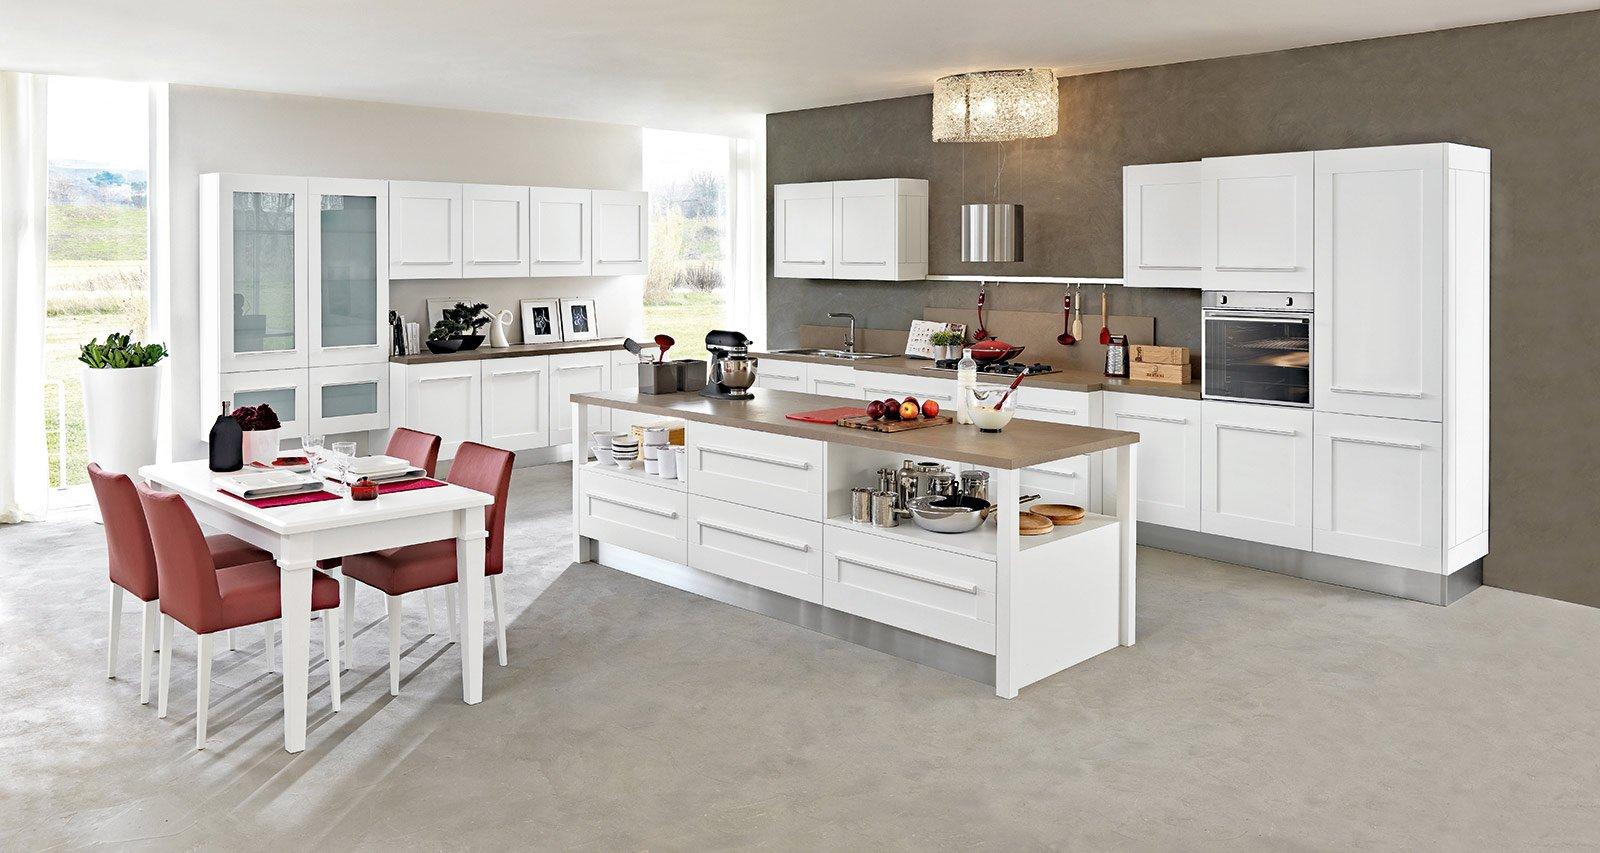 Cucina la voglio tutta bianca cose di casa for Accessori da parete per cucina